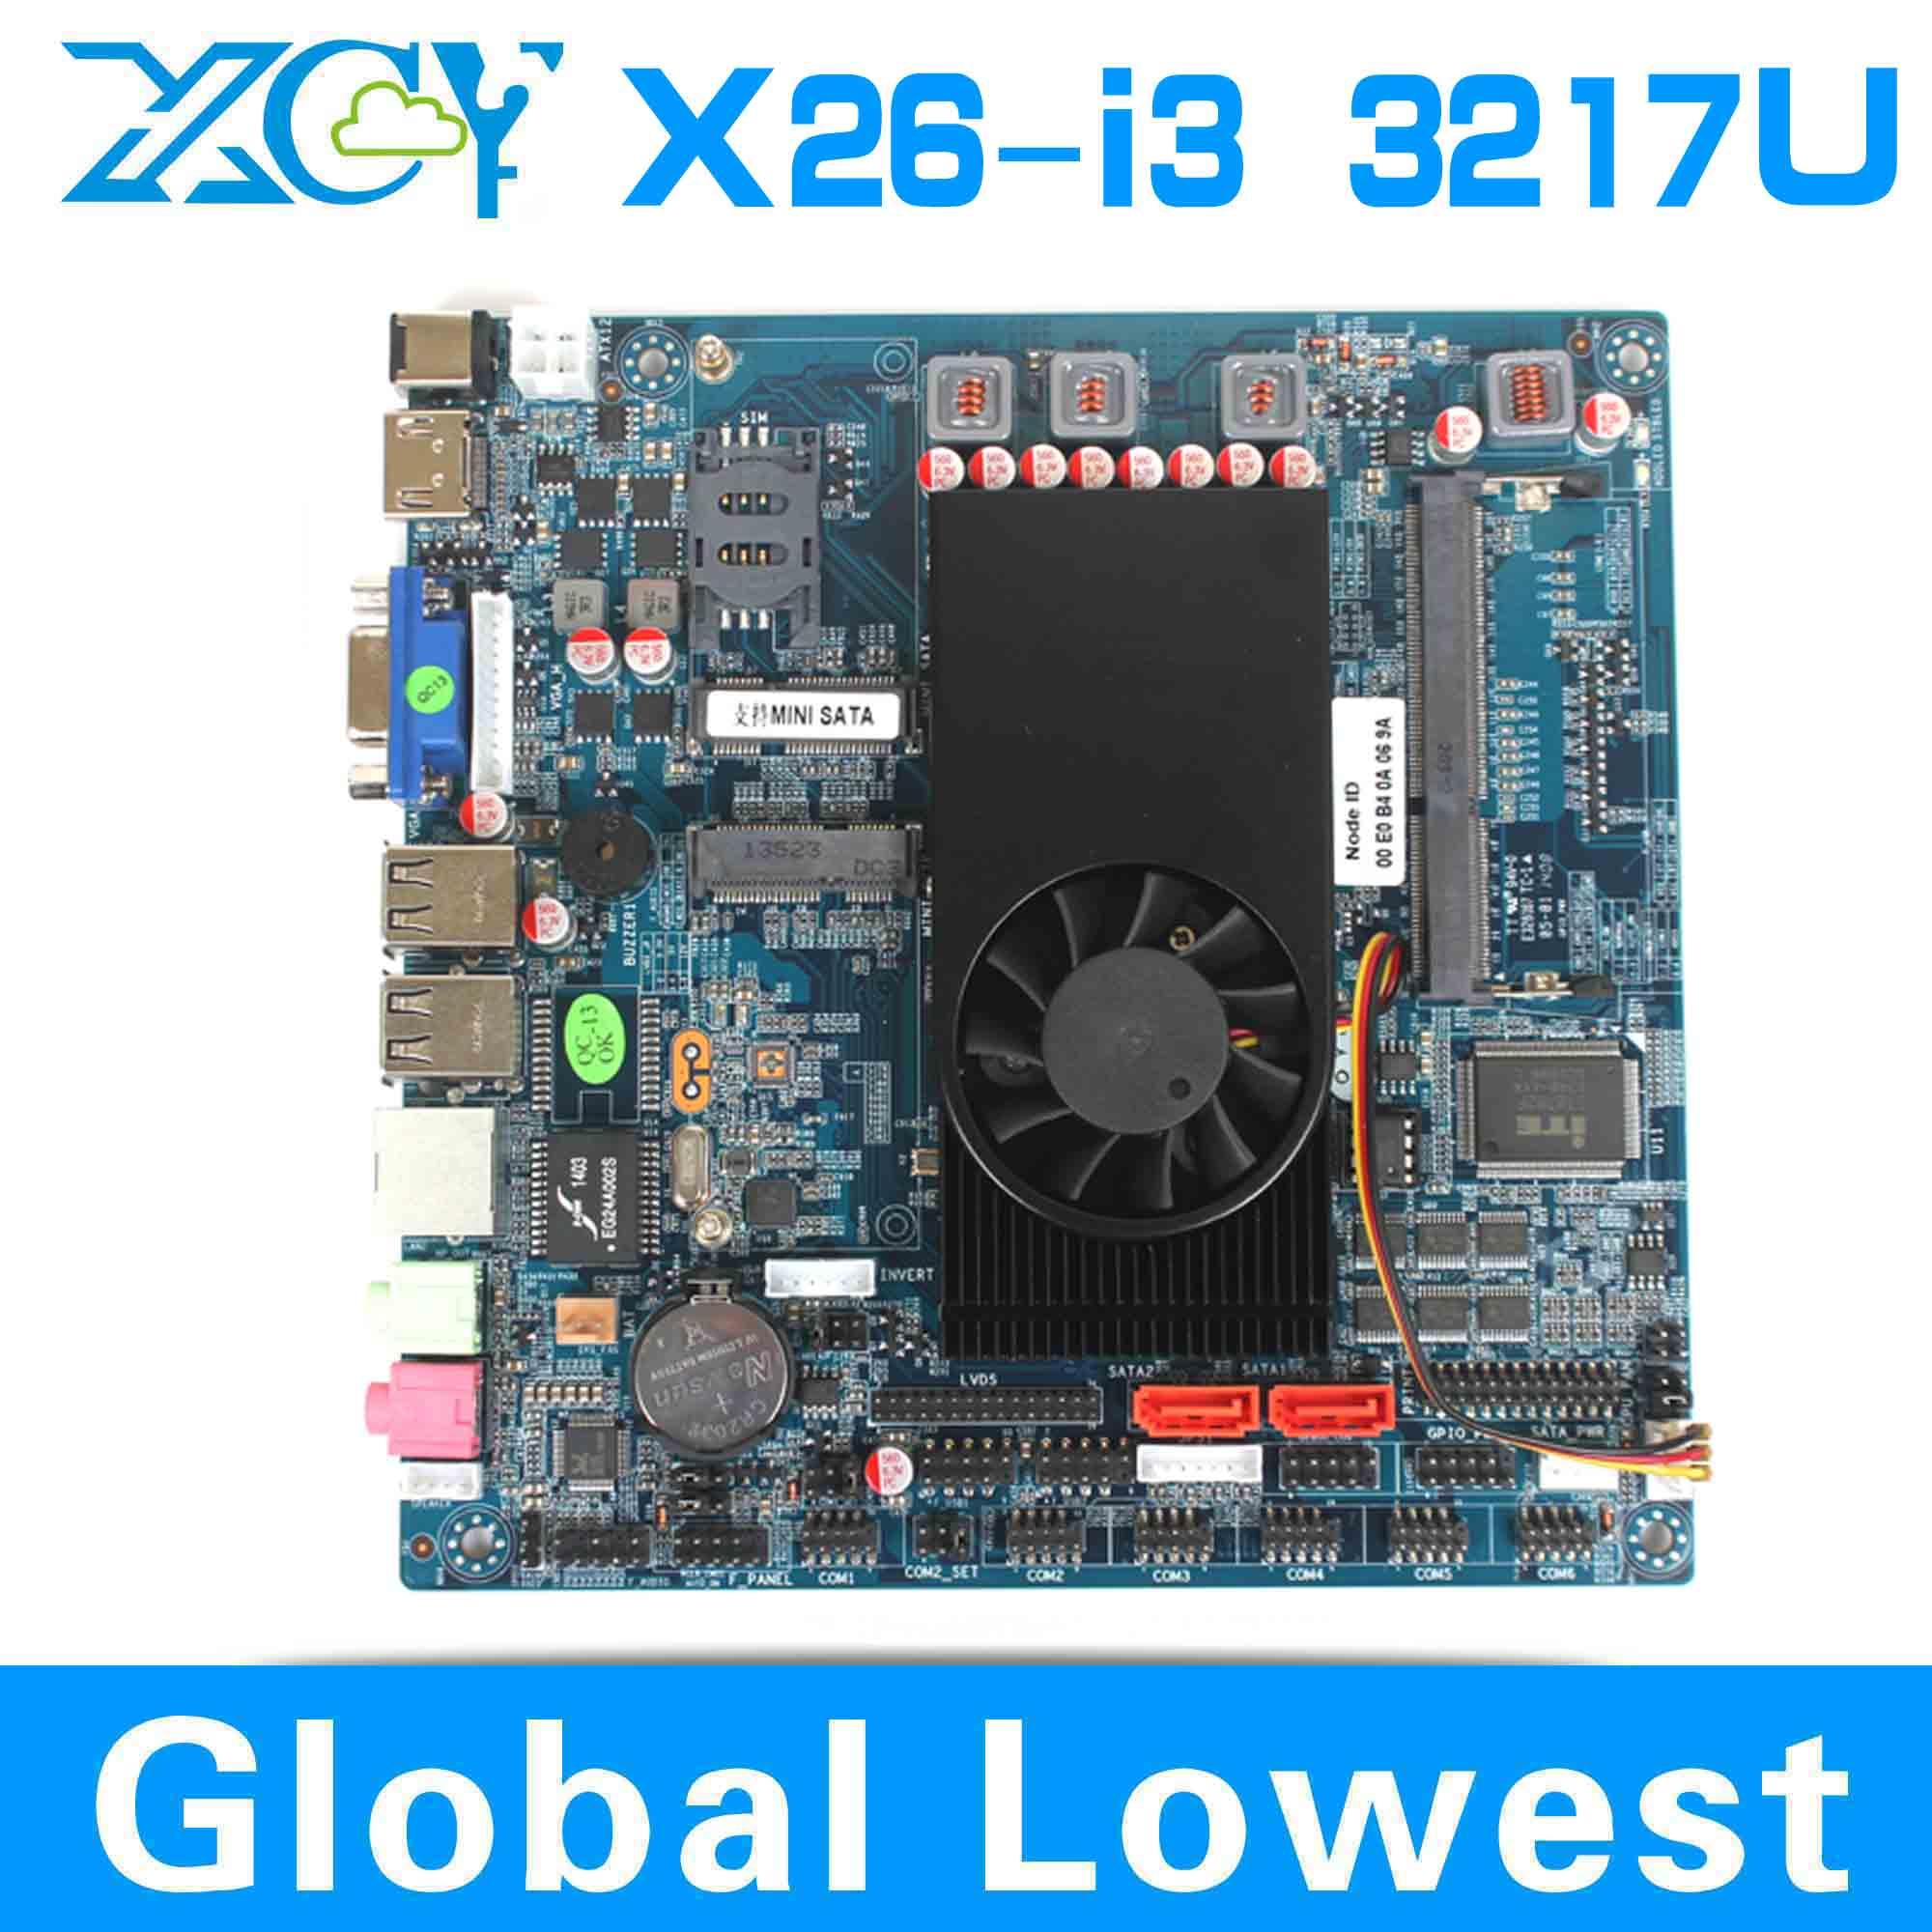 Intel I3 3217u core dual mini motherboard, XCY X26-I3 Mini-ITX main board, Micro main board(China (Mainland))